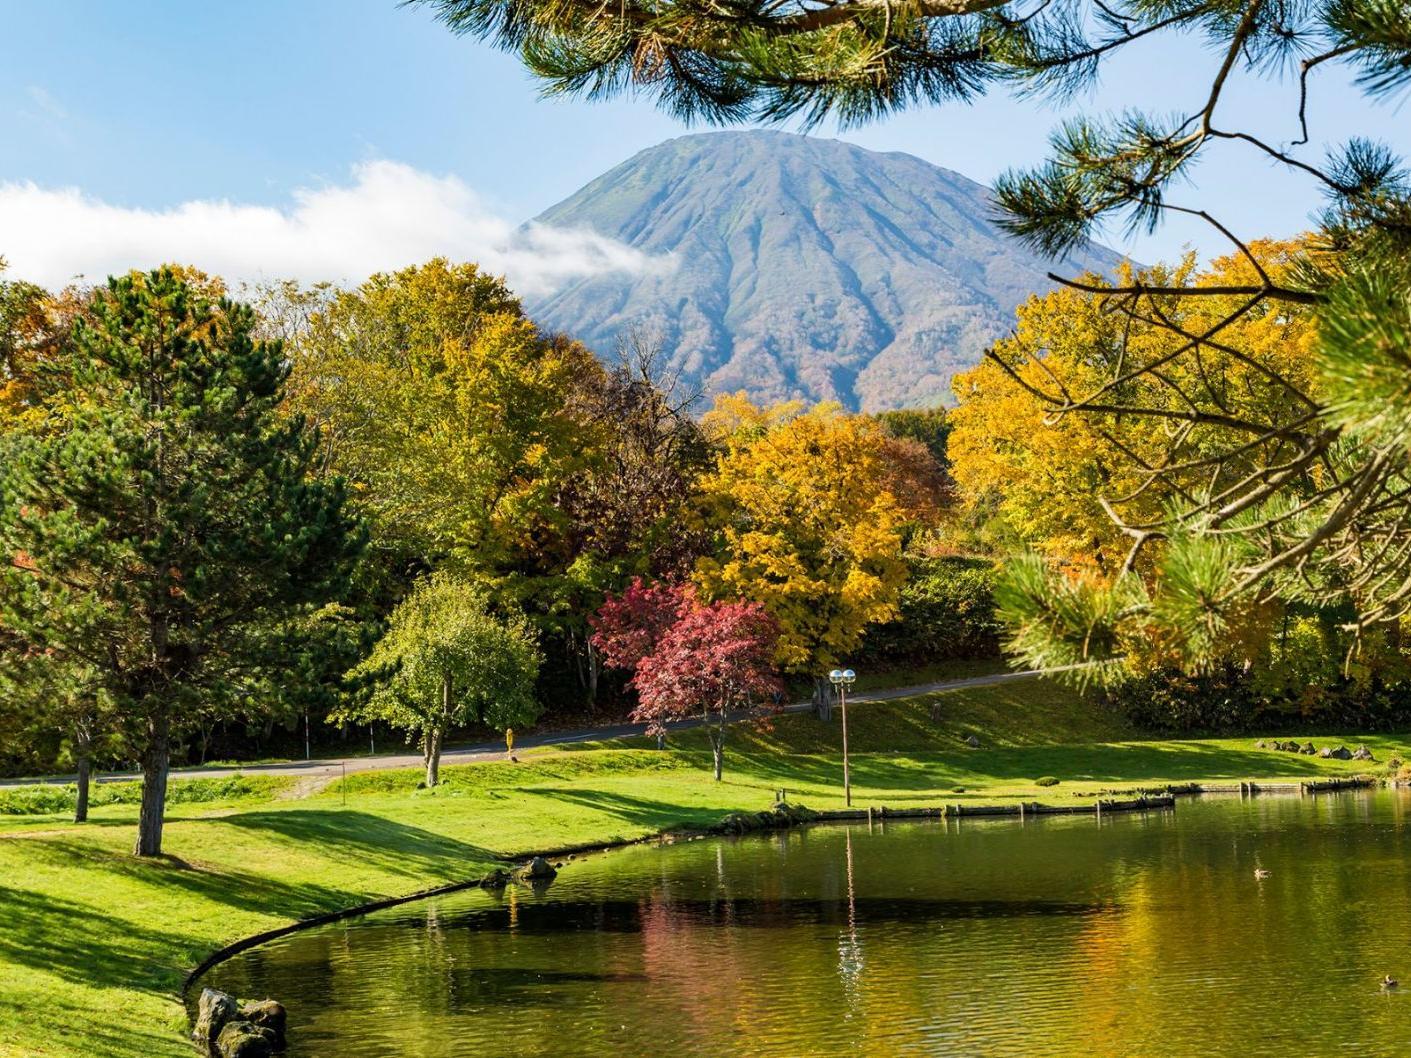 Great view of Fukidashi park near Chatrium Niseko Japan